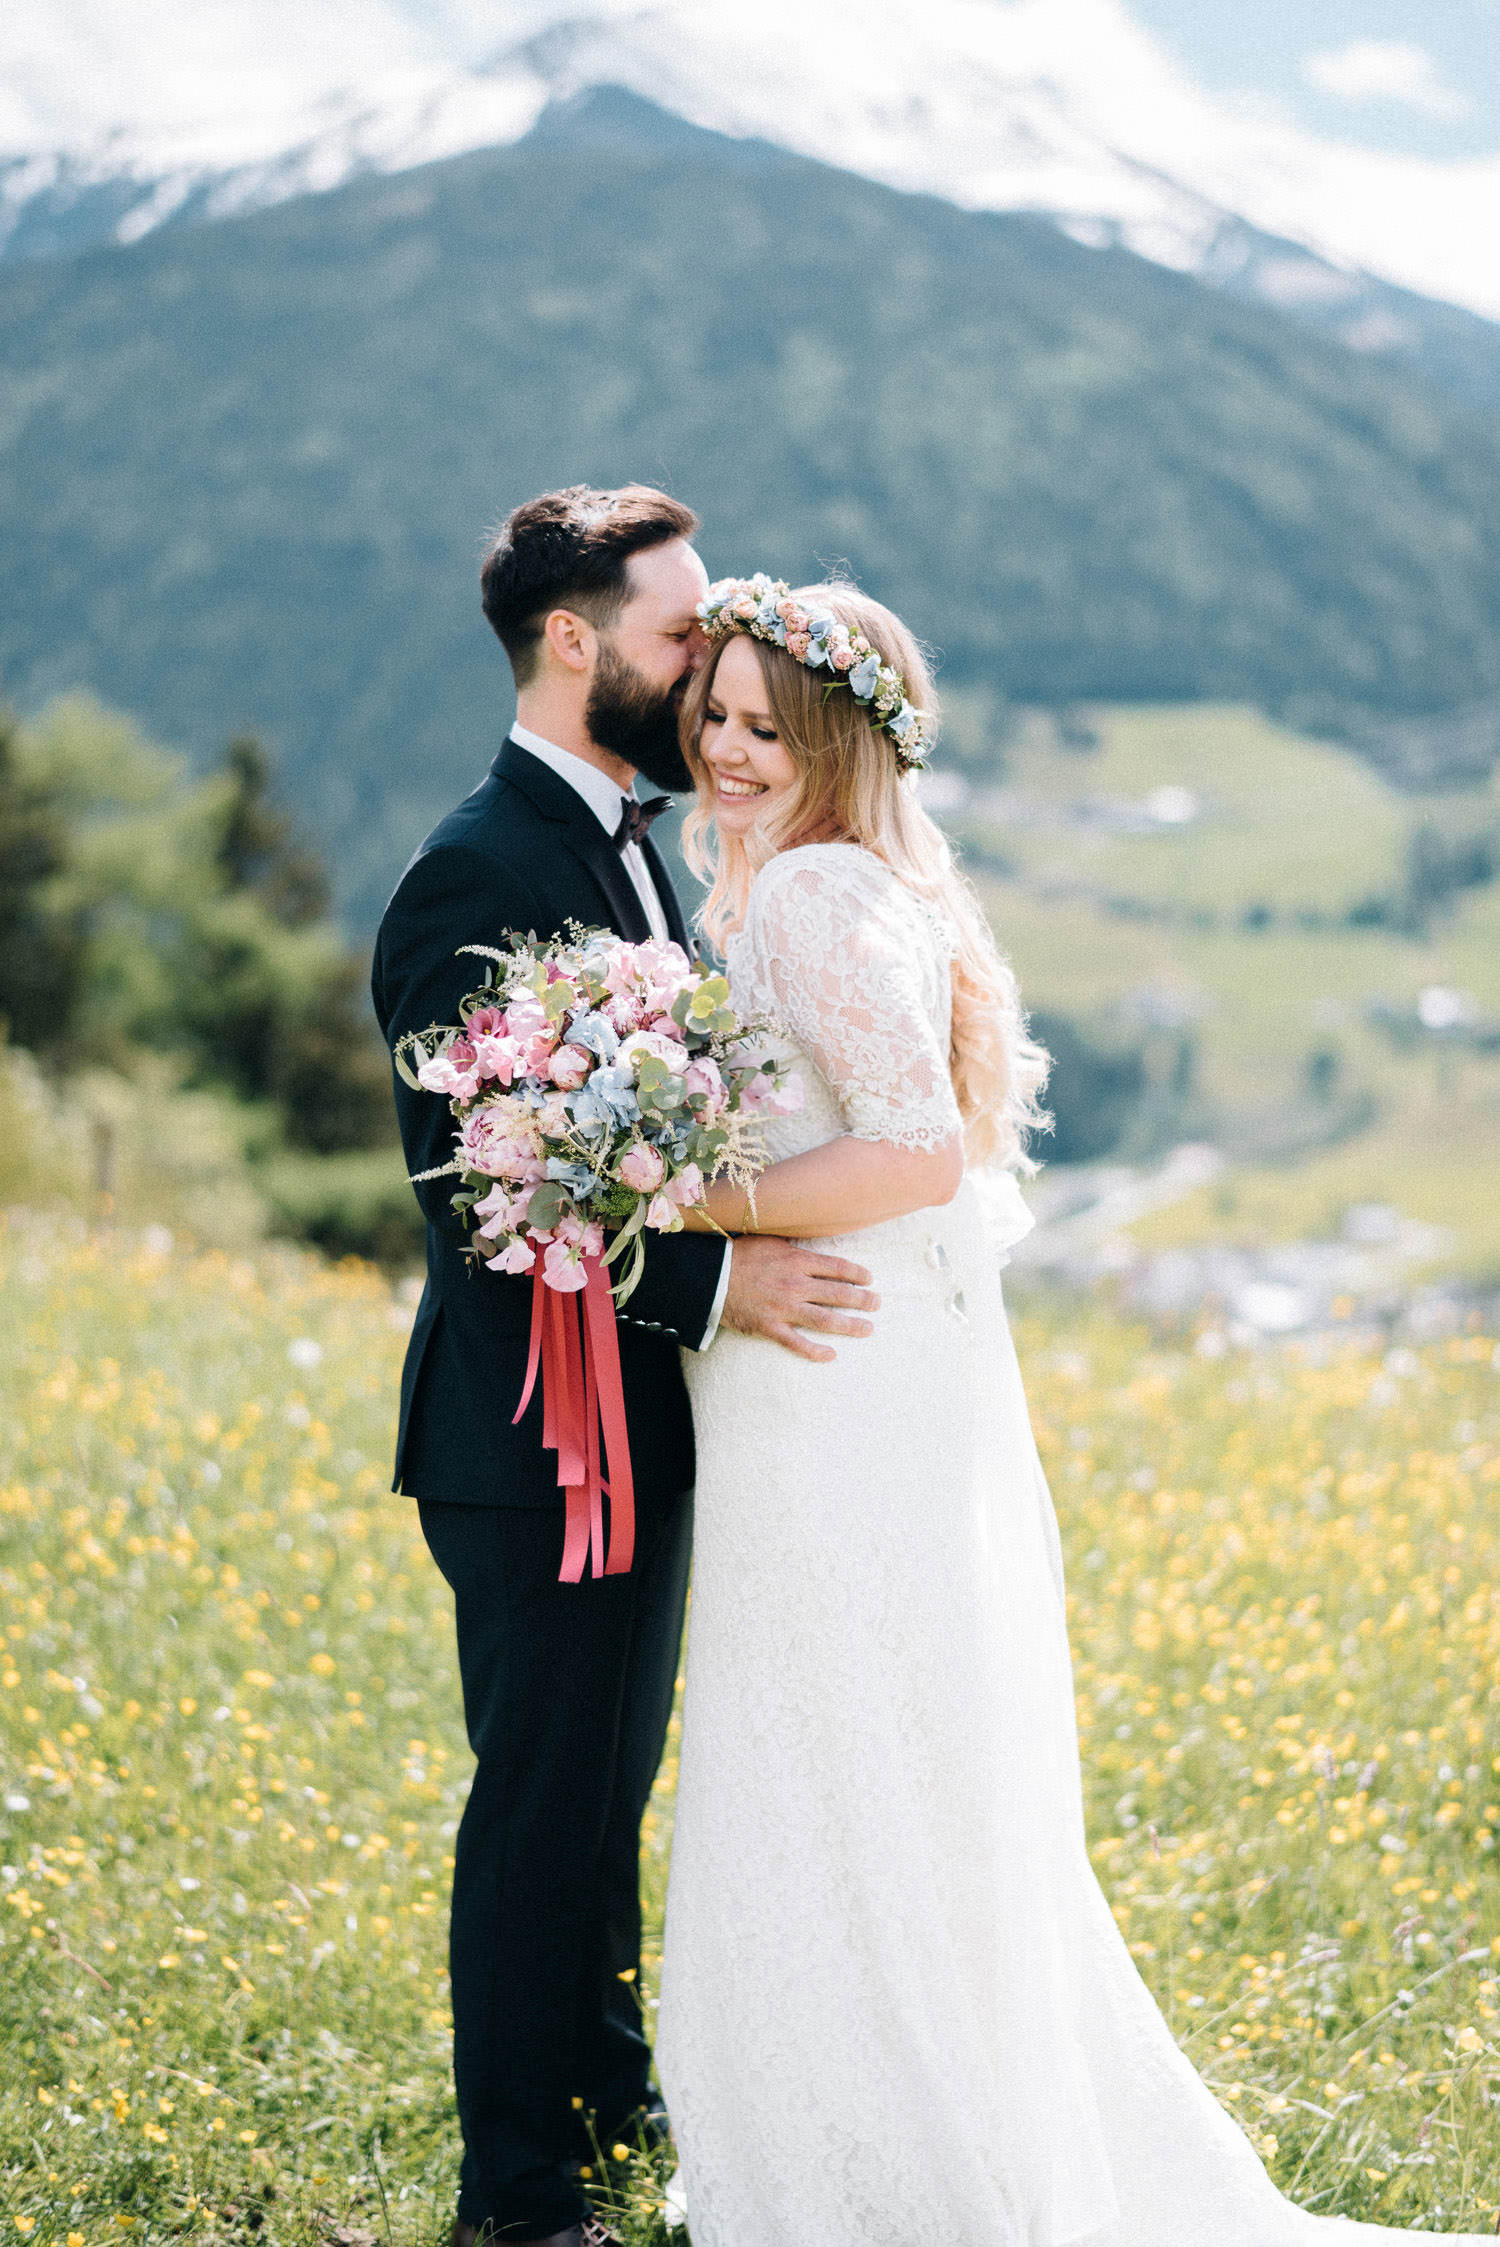 hochzeit-schloss-mittersill-heiraten-in-den-bergen-hochzeitsfotografin-mariagadringer-037.jpg